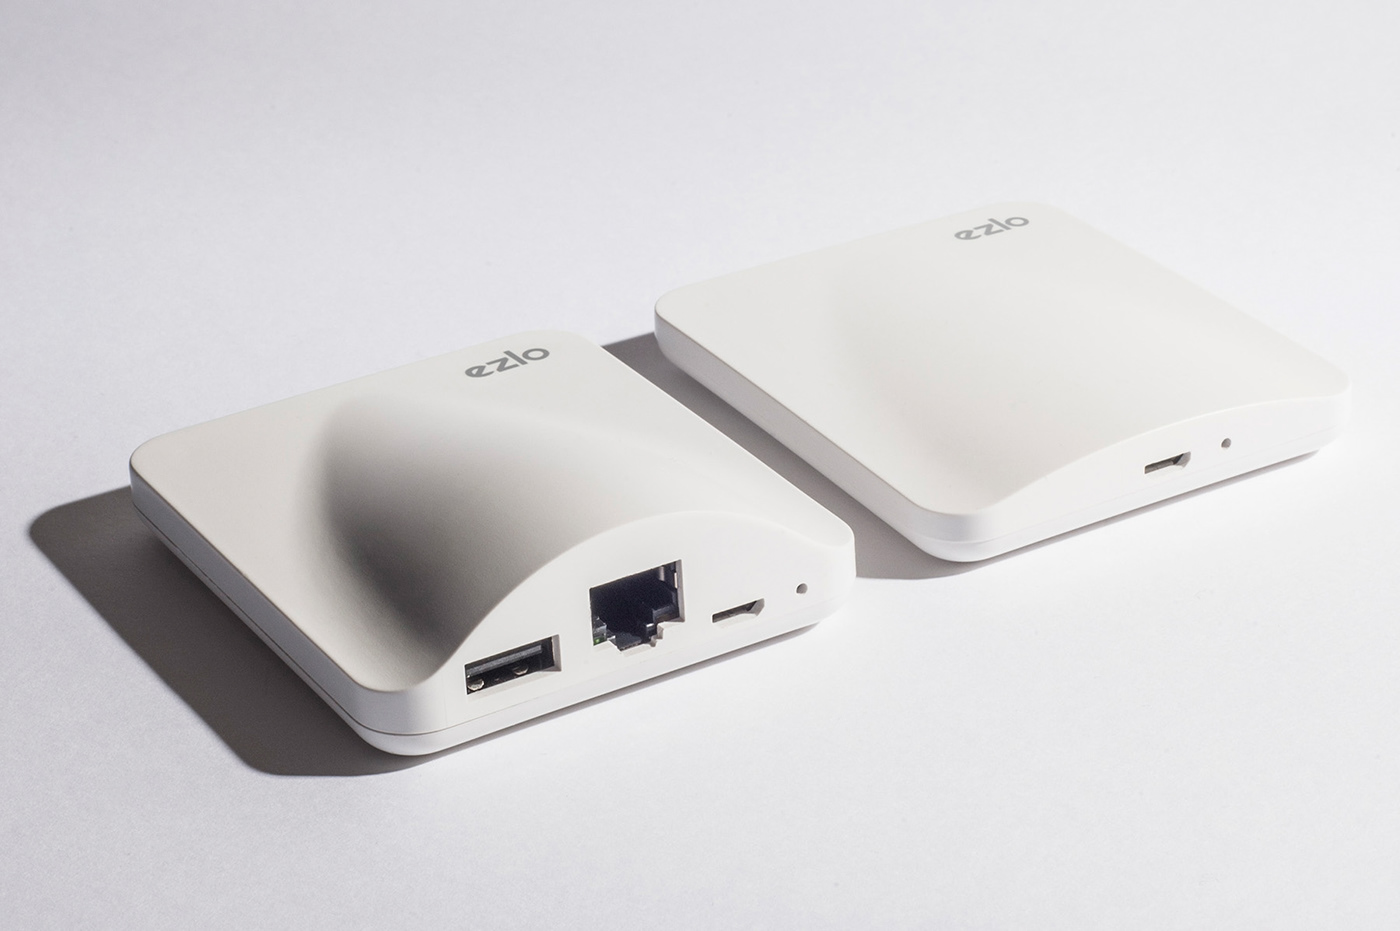 Electronics consumer electronics Mesch Wi-Fi system gateway Router wifi Internet wireless Smart Home IoT